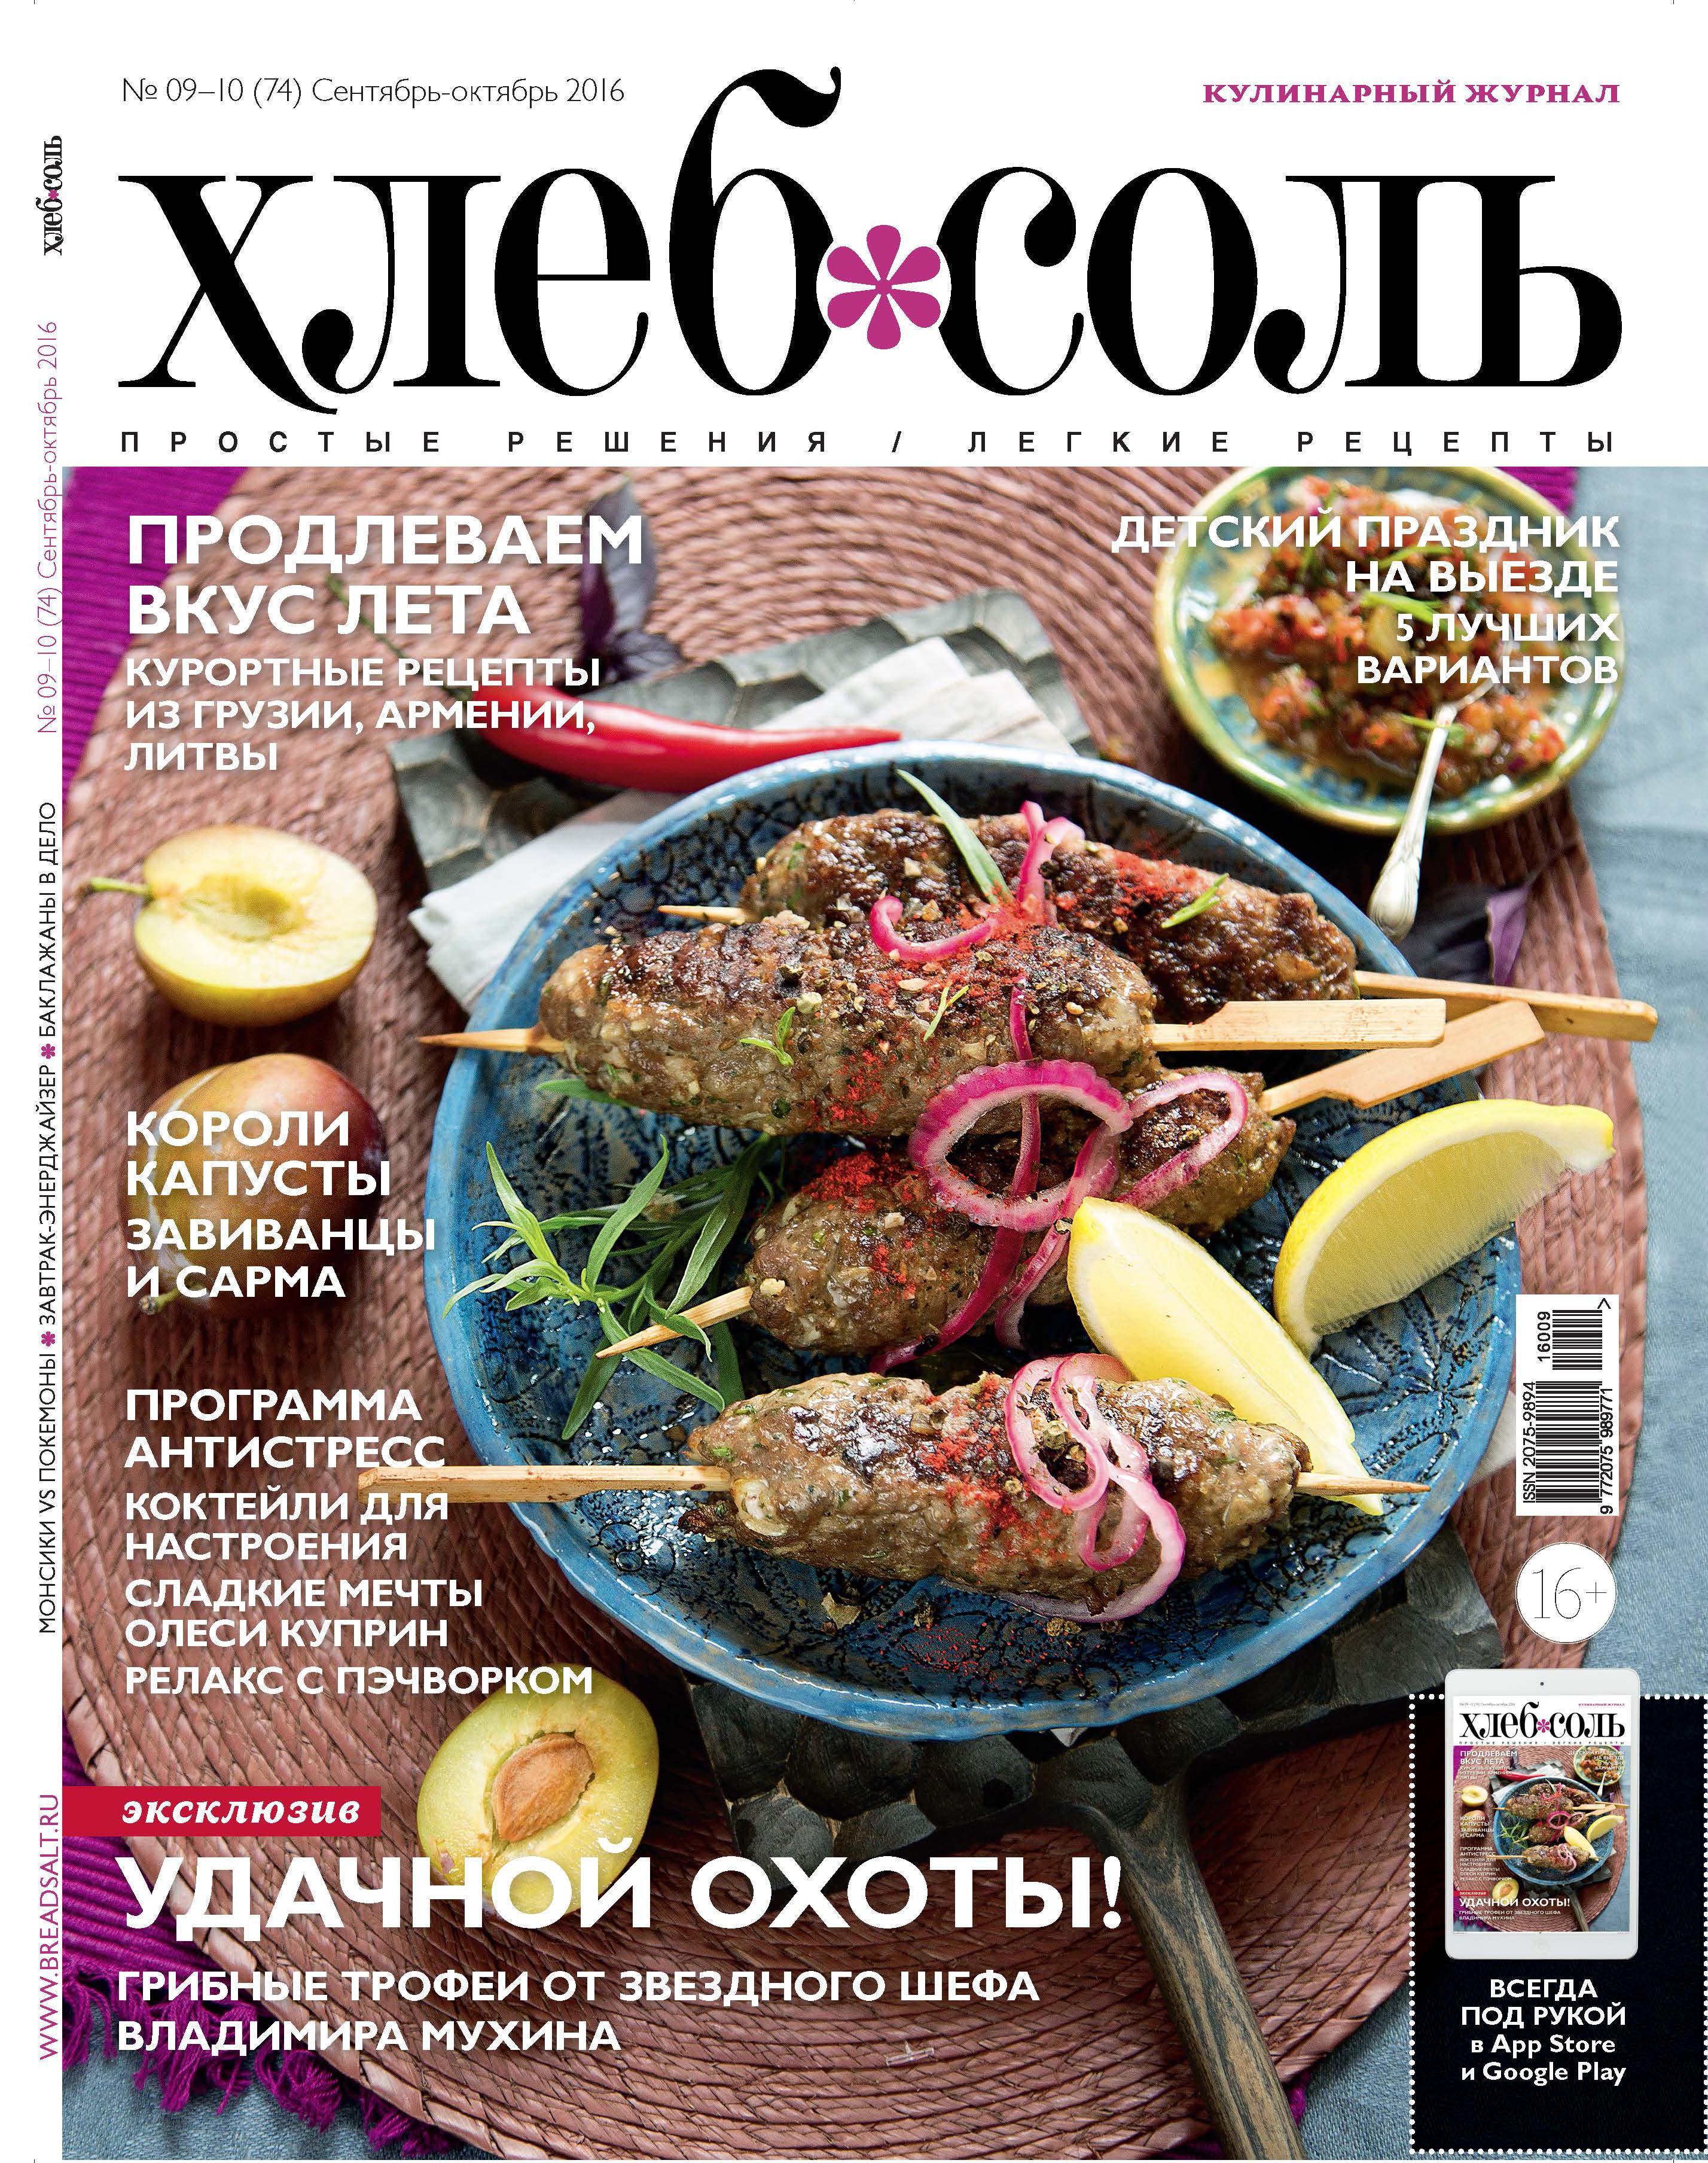 Журнал ХлебСоль № 9-10 сентябрь-октябрь 2016 журнал инстайл октябрь 2011